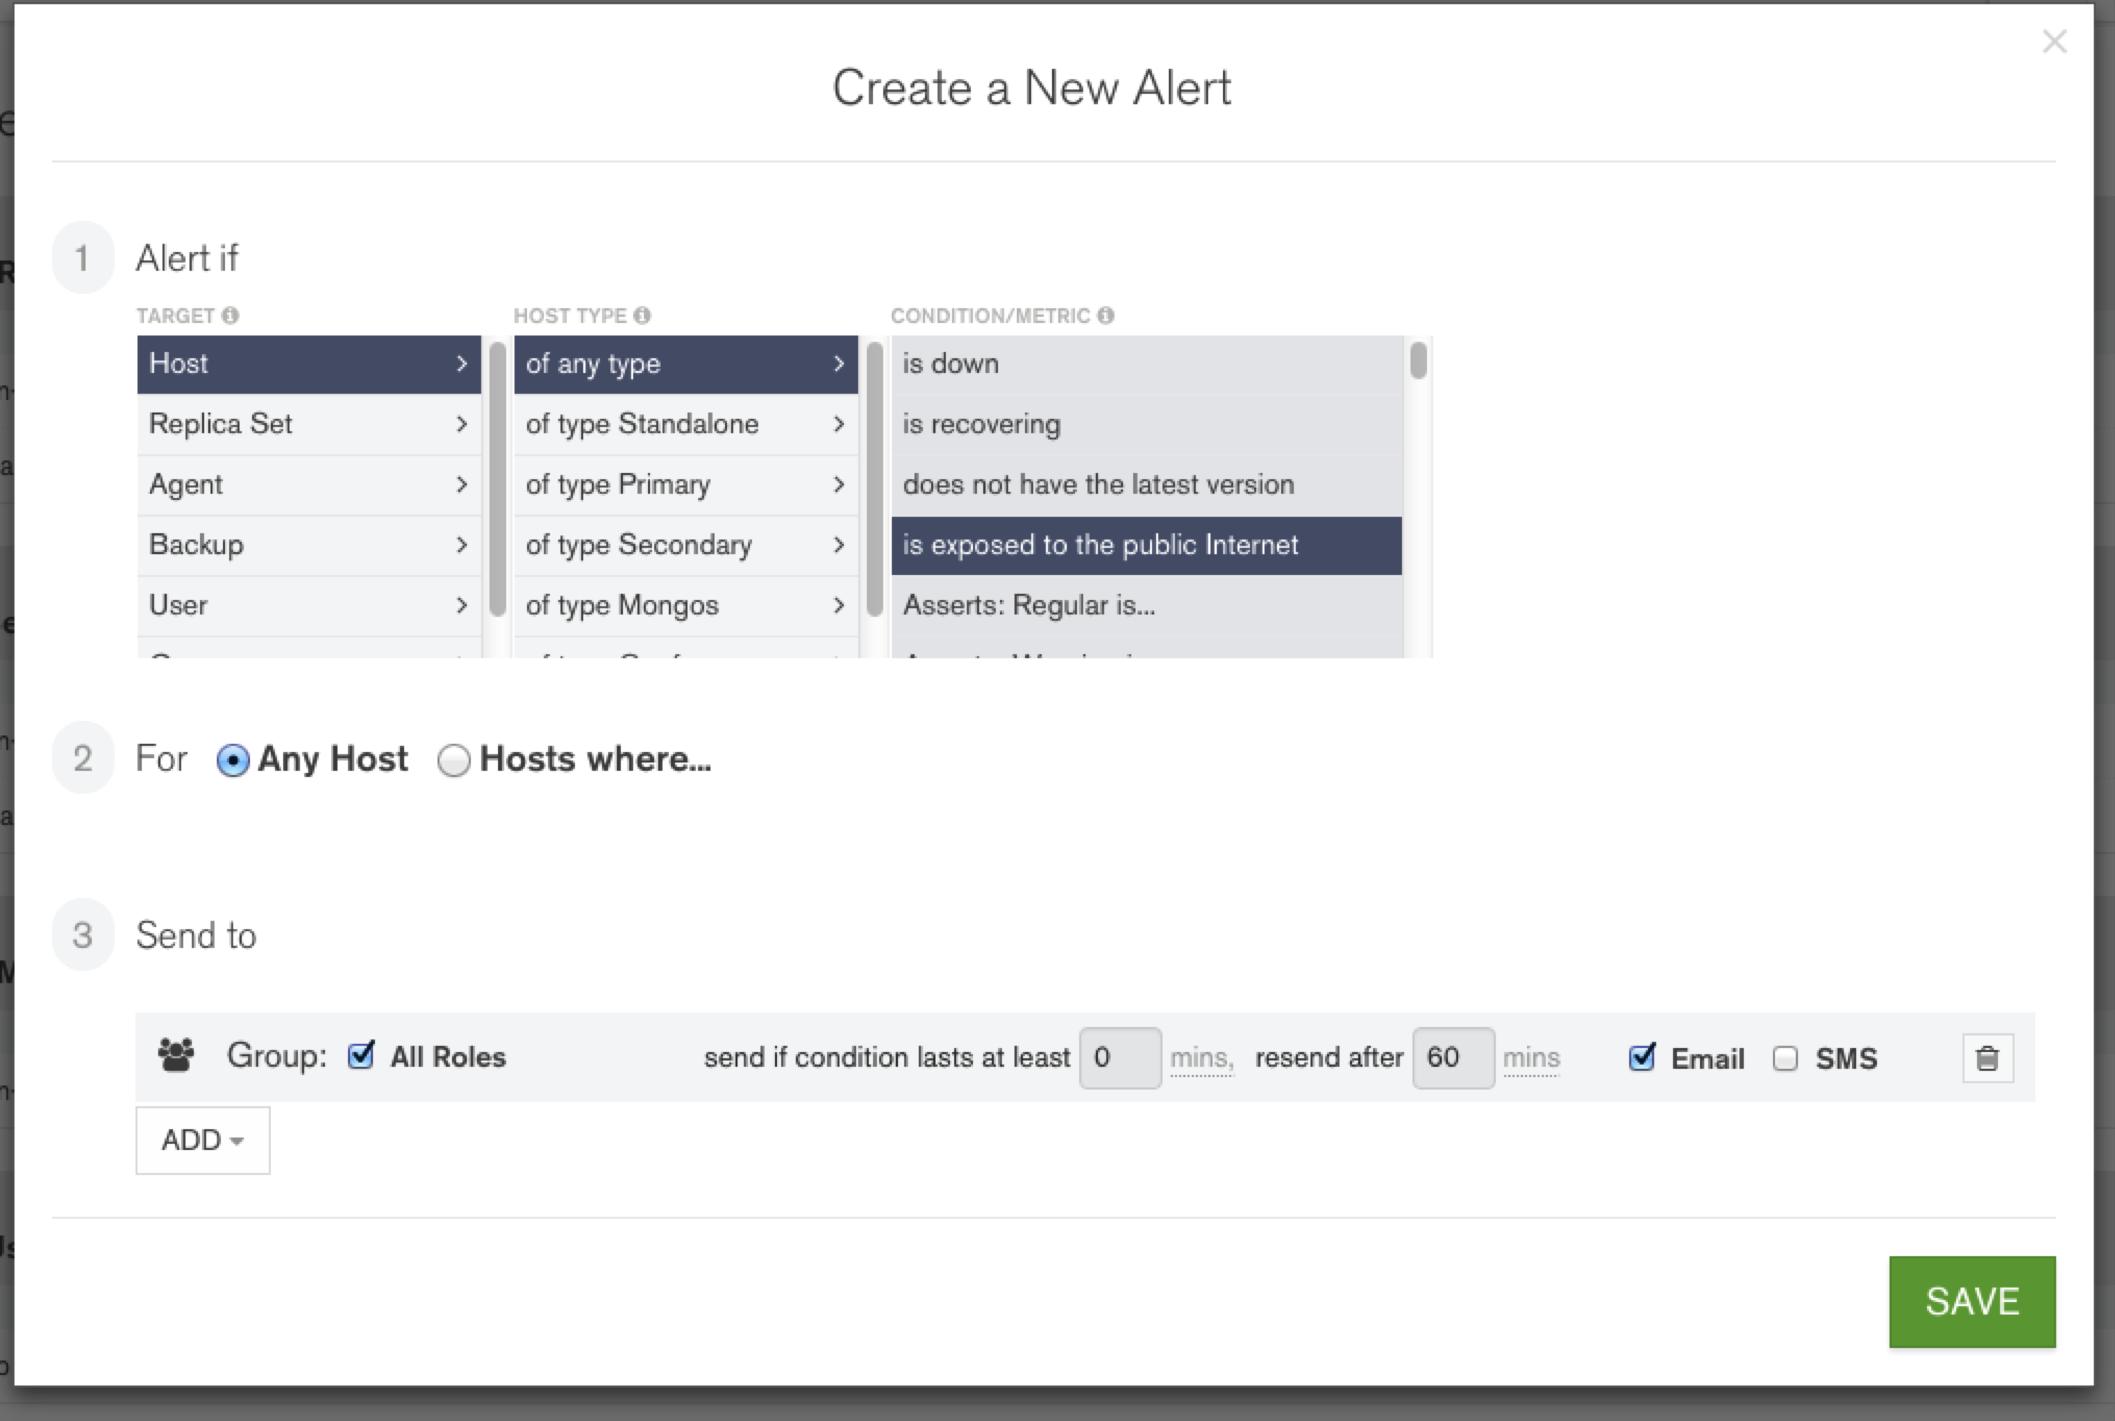 Create a new alert